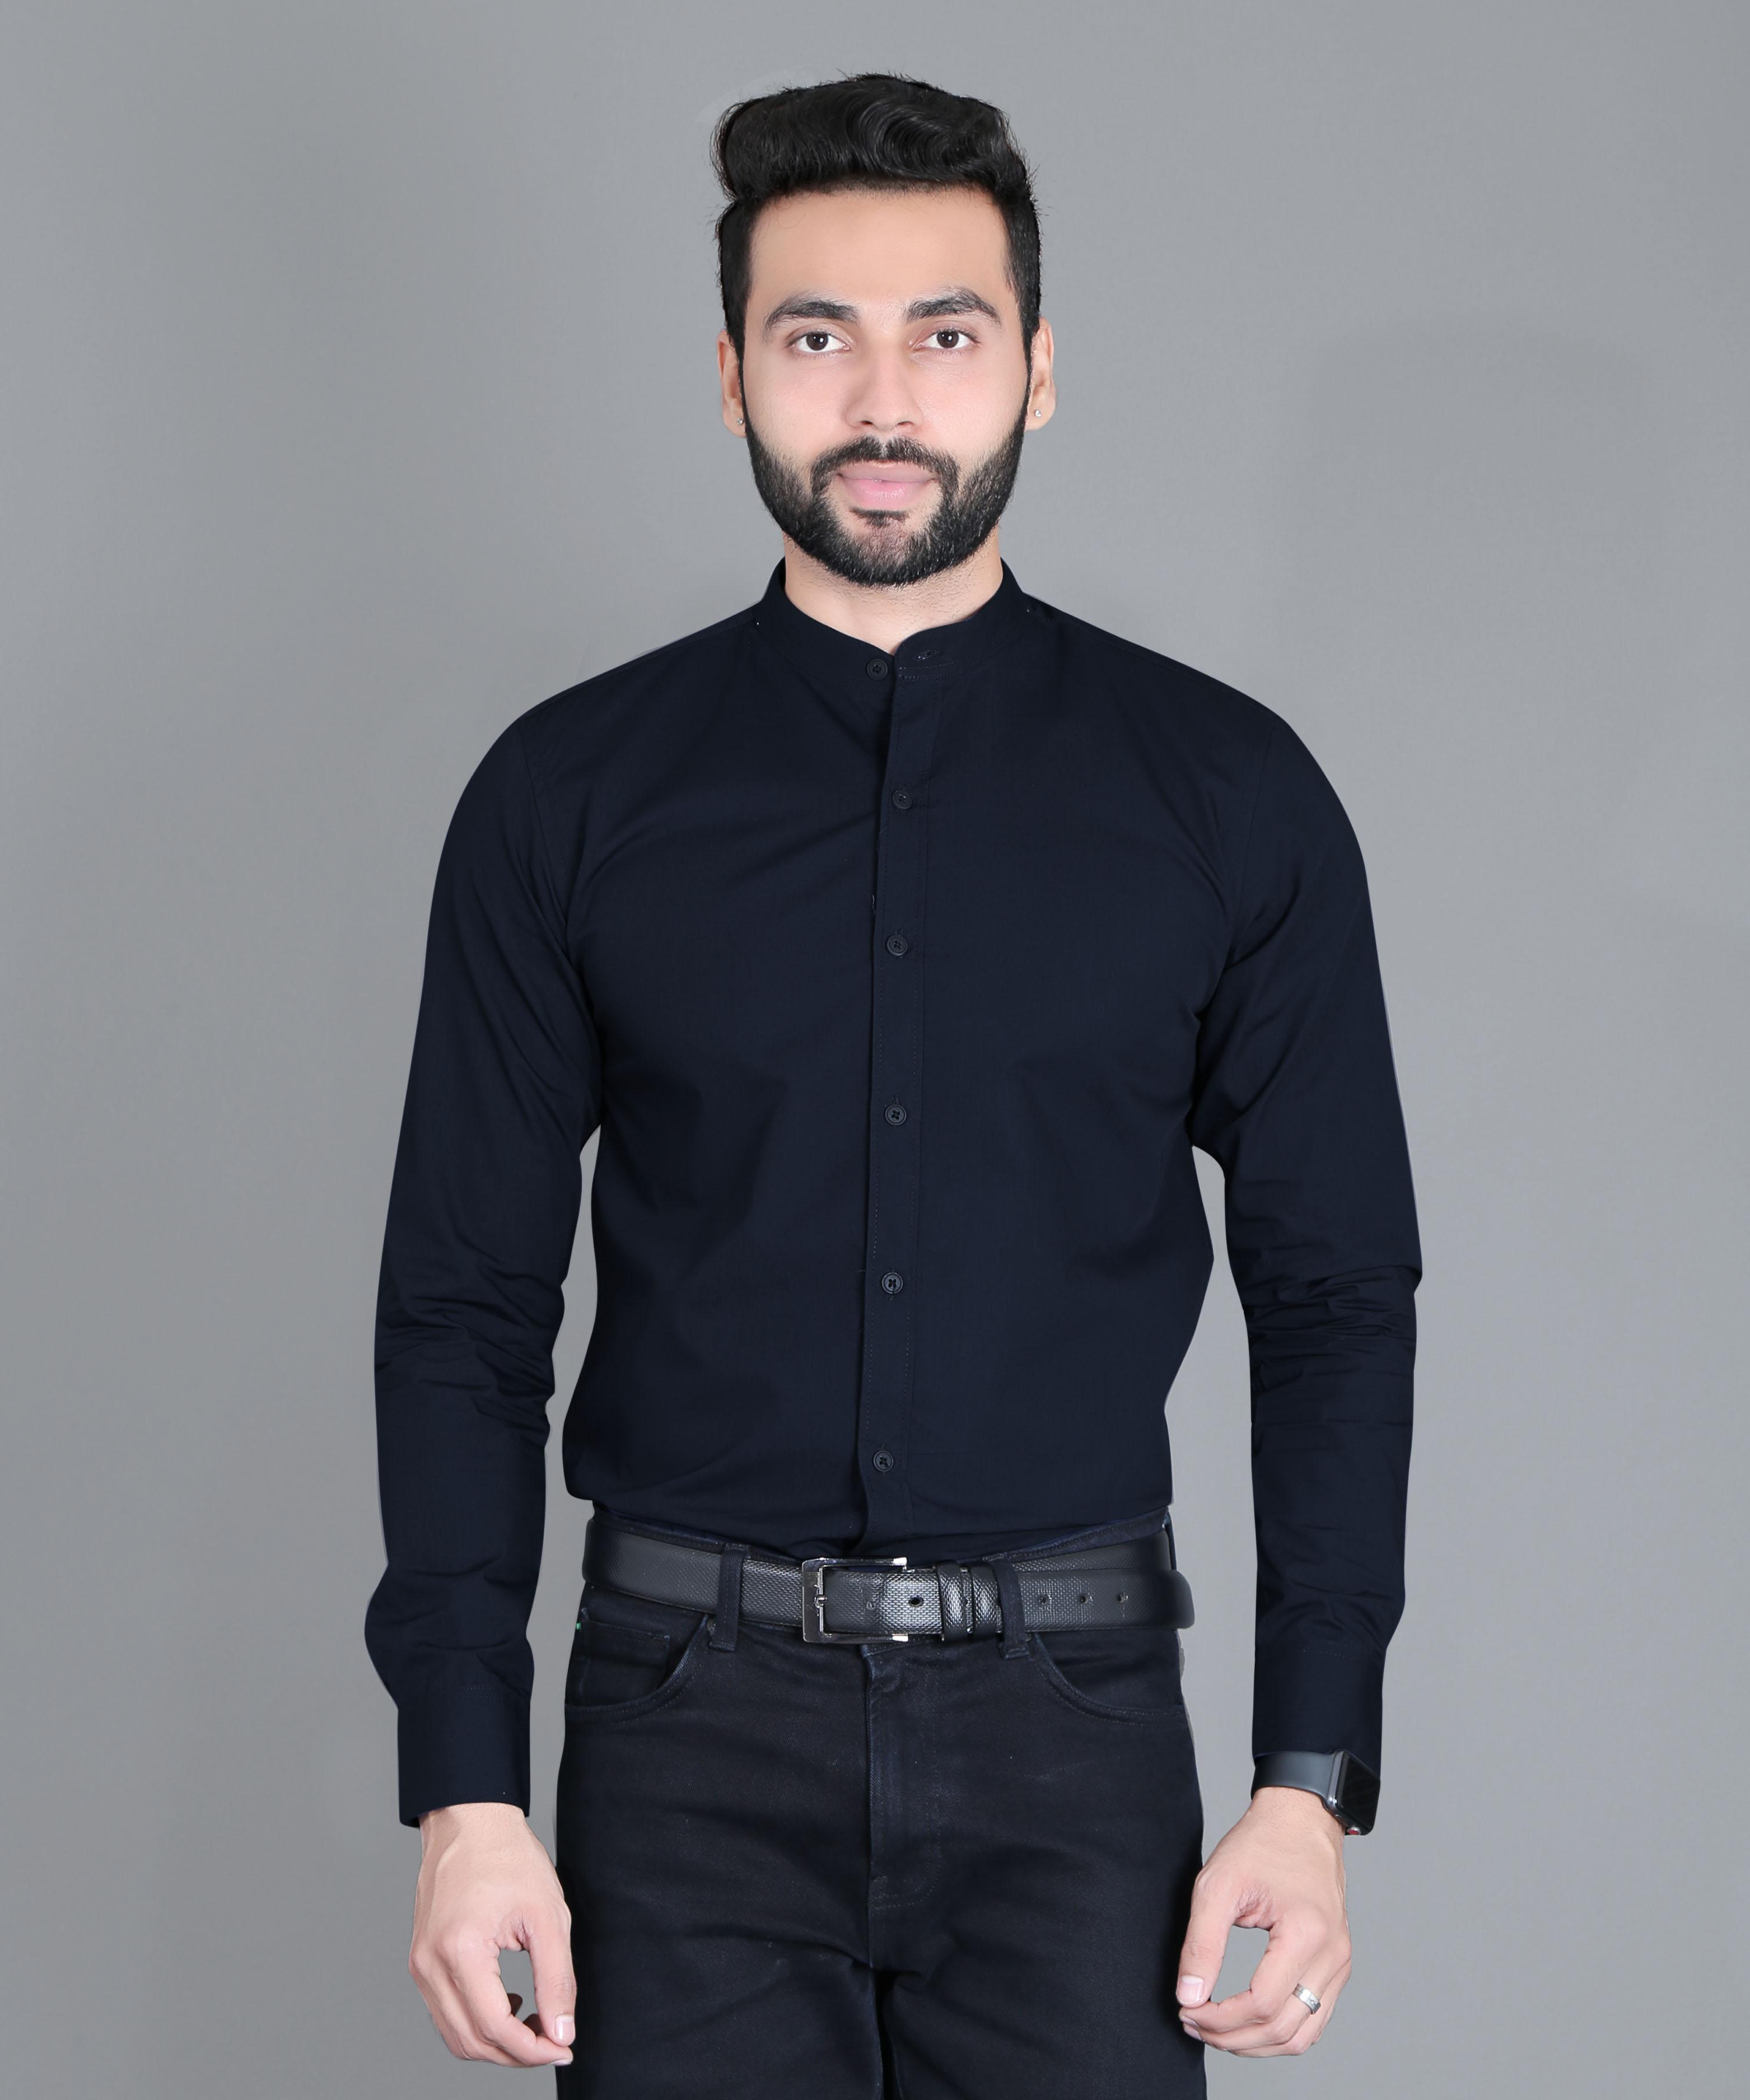 FIFTH ANFOLD Formal Mandrin Collar full Sleev/Long Sleev Navy Blue Pure Cotton Plain Solid Men Shirt